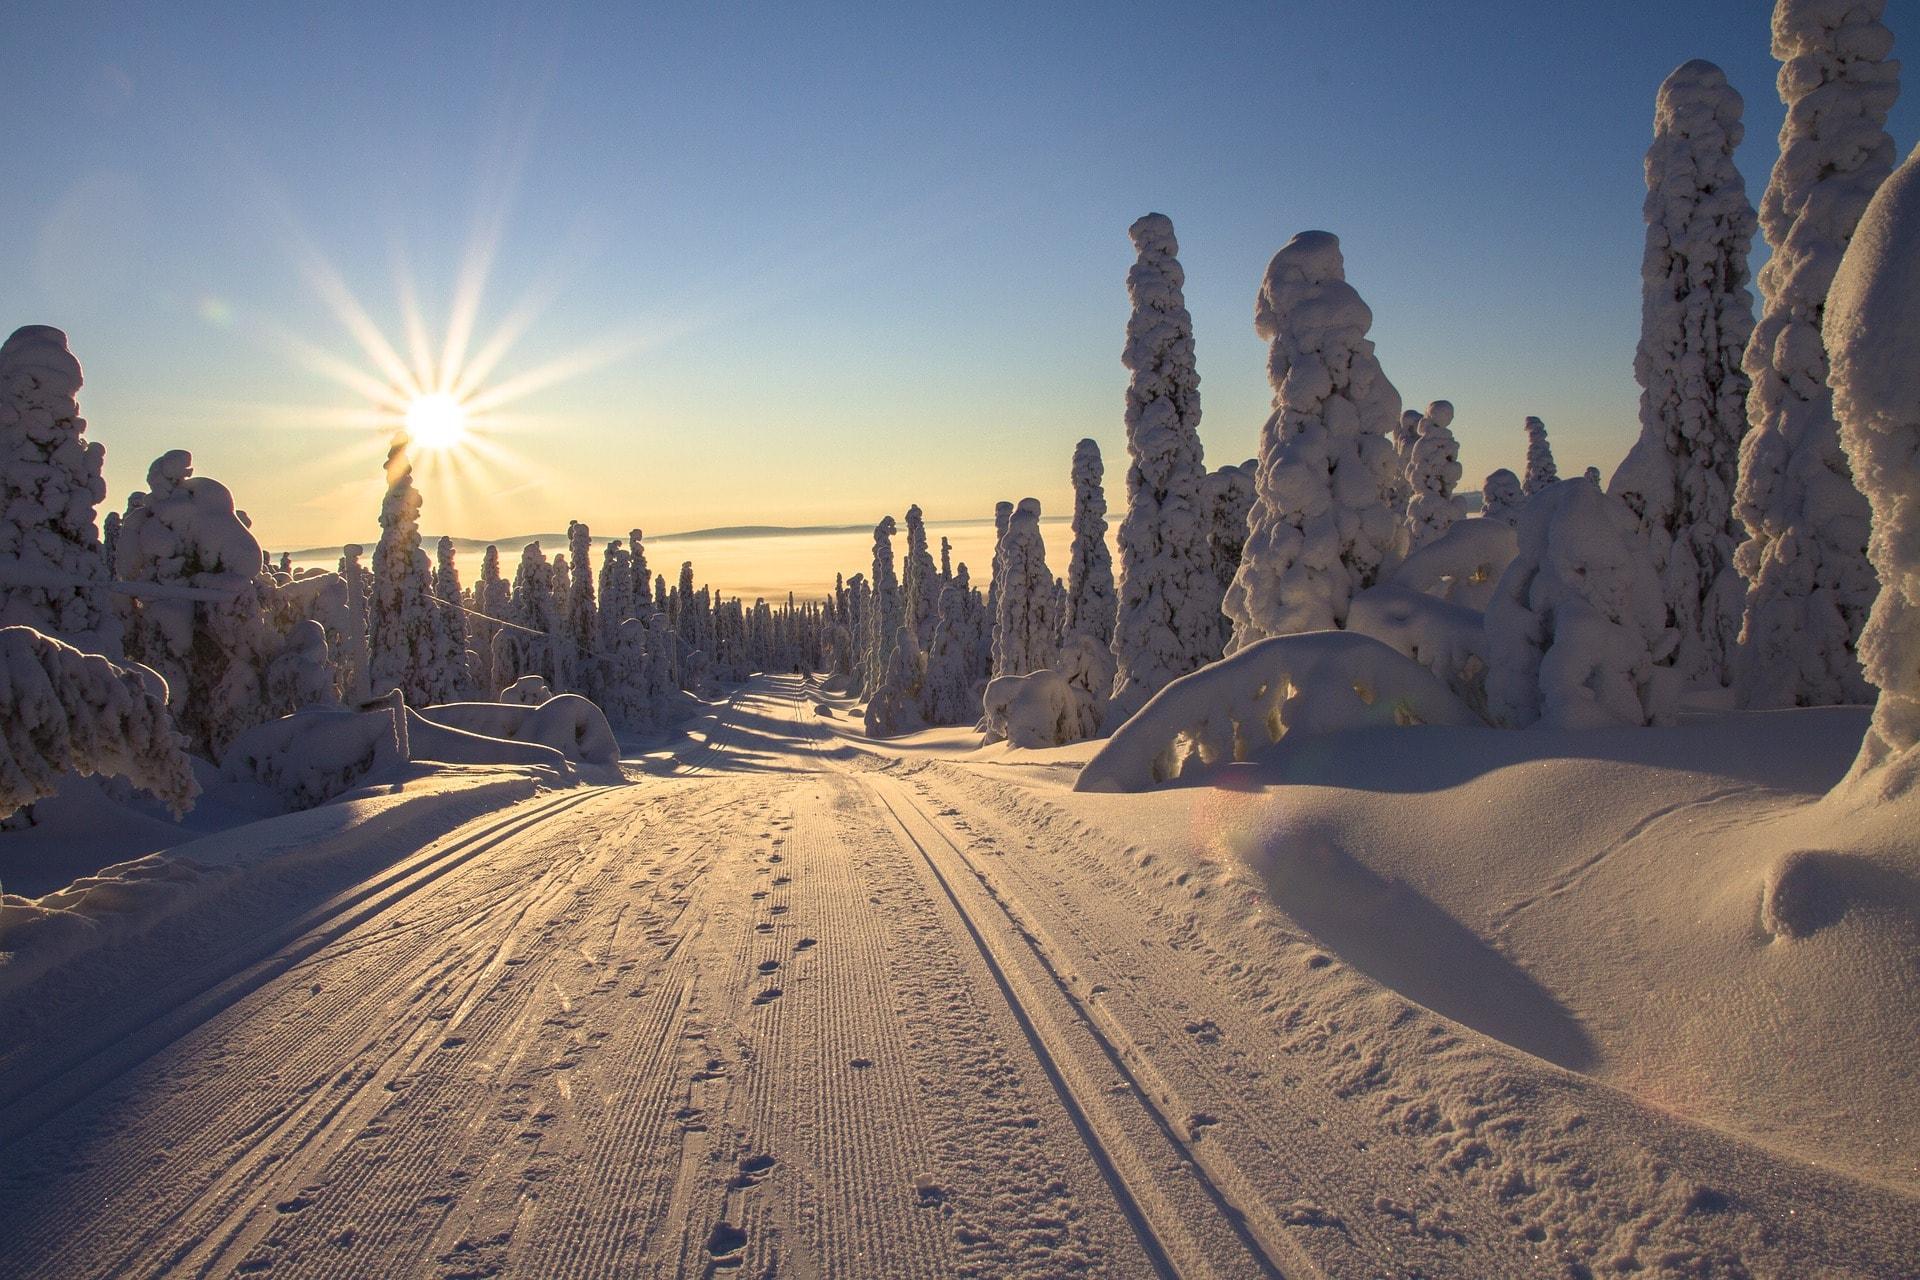 finland-2215318_1920-min